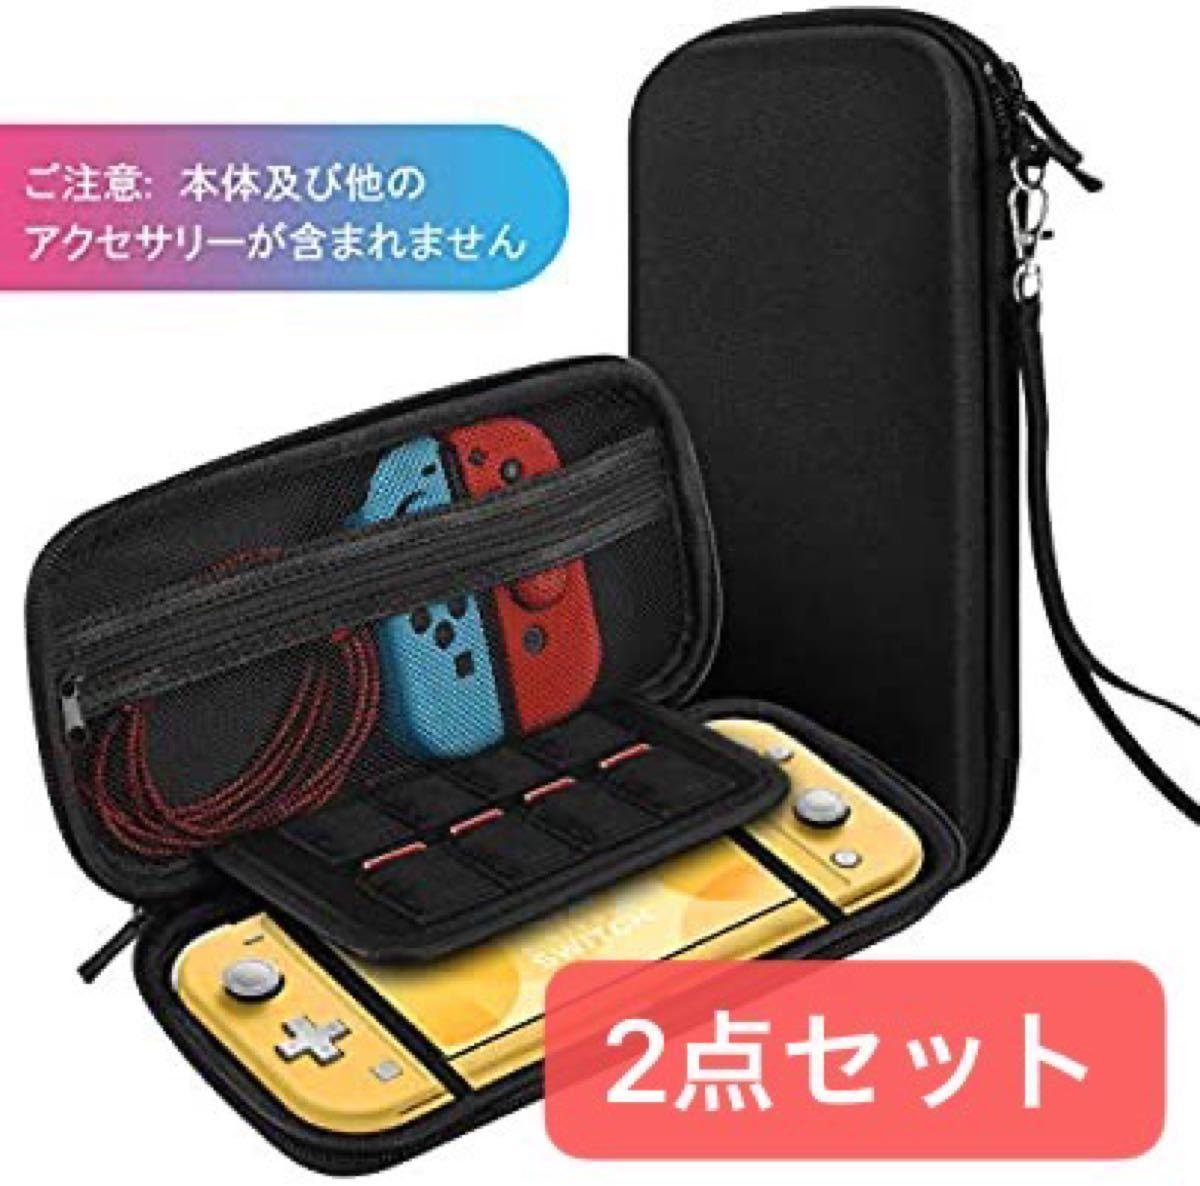 Nintendo switch lite カバー 収納ケース任天堂 2点セット